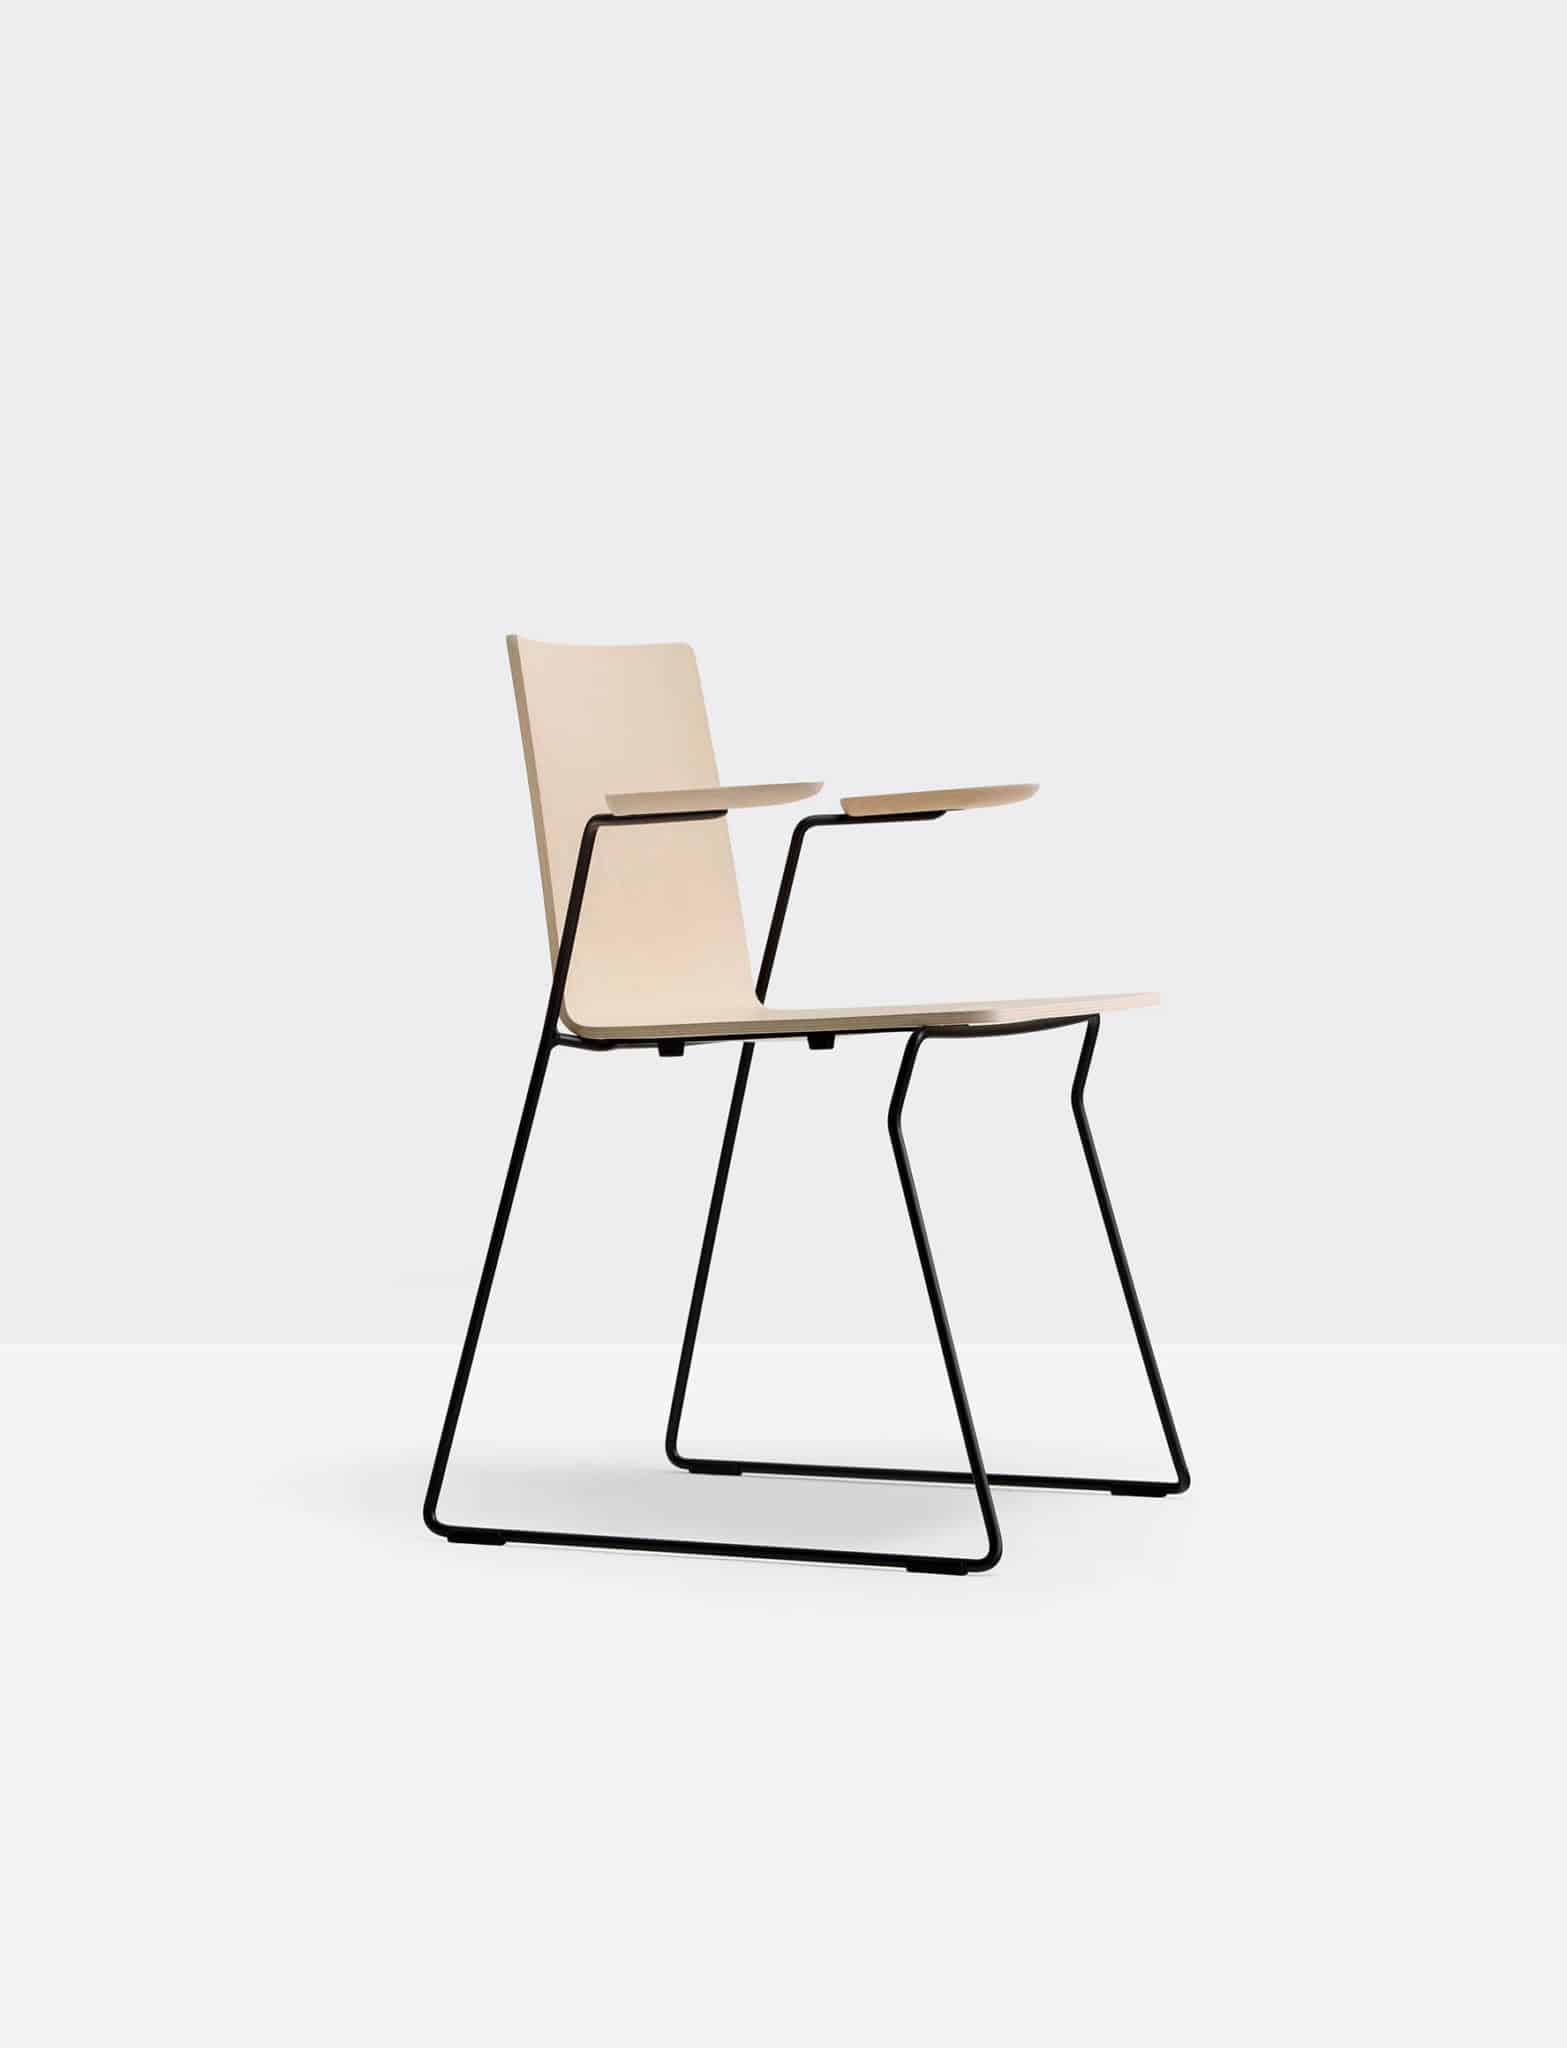 PEDRALI OSAKA 5715 chaise bois avec accoudoirs piétement métal